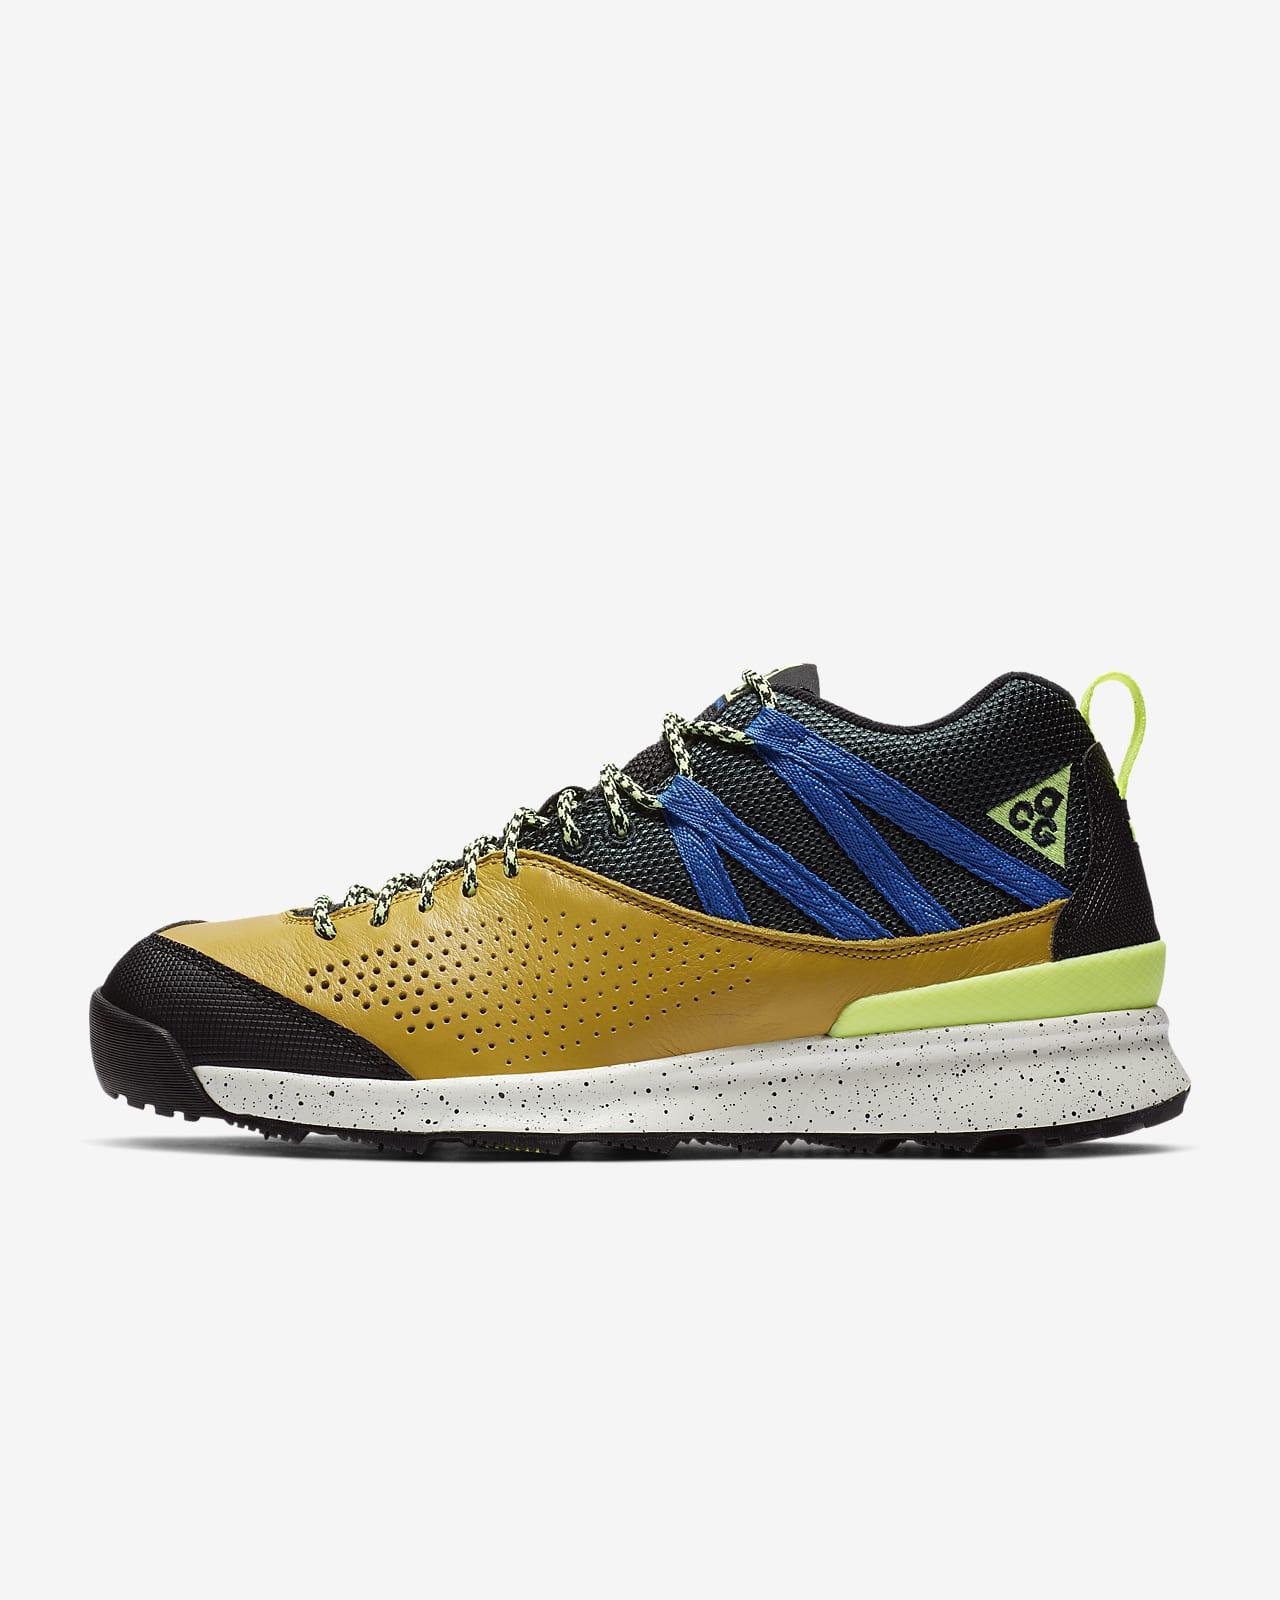 desempleo Palpitar posterior  Nike Okwahn II Men's Shoe. Nike.com